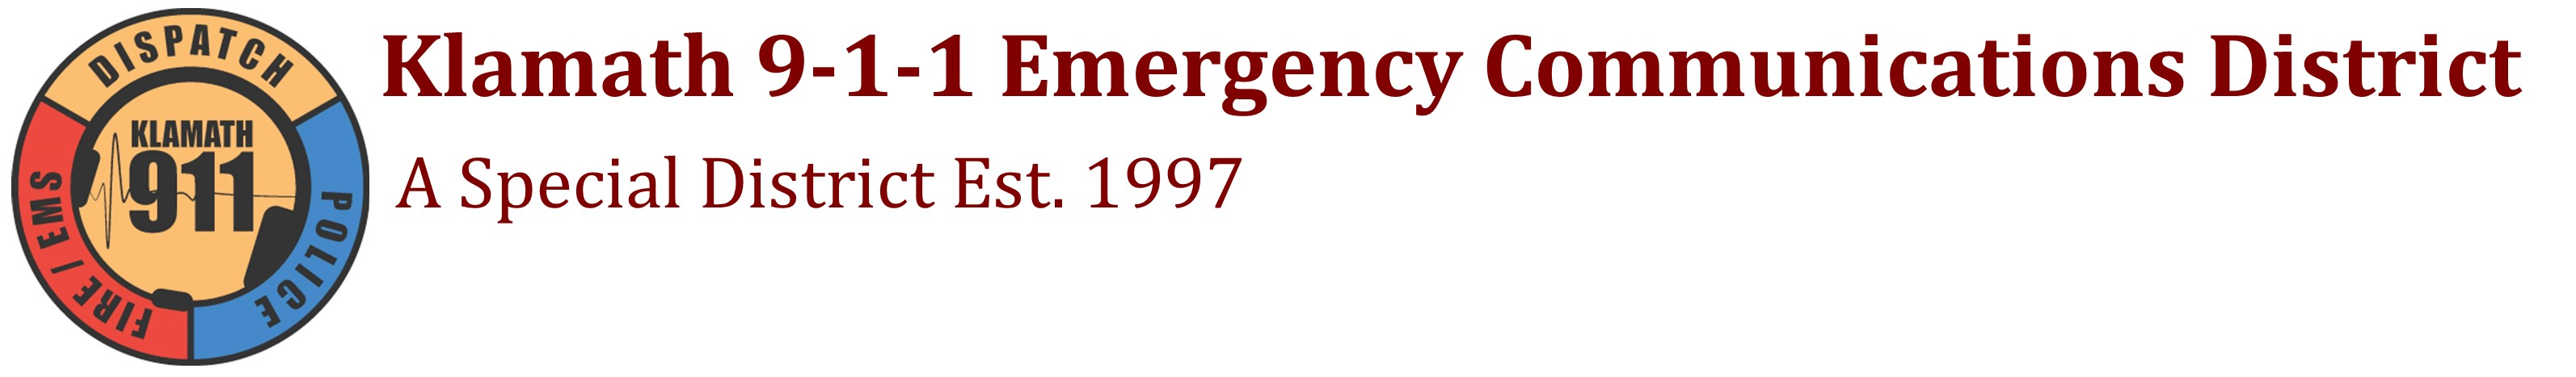 Klamath 9-1-1 Emergency Communications District